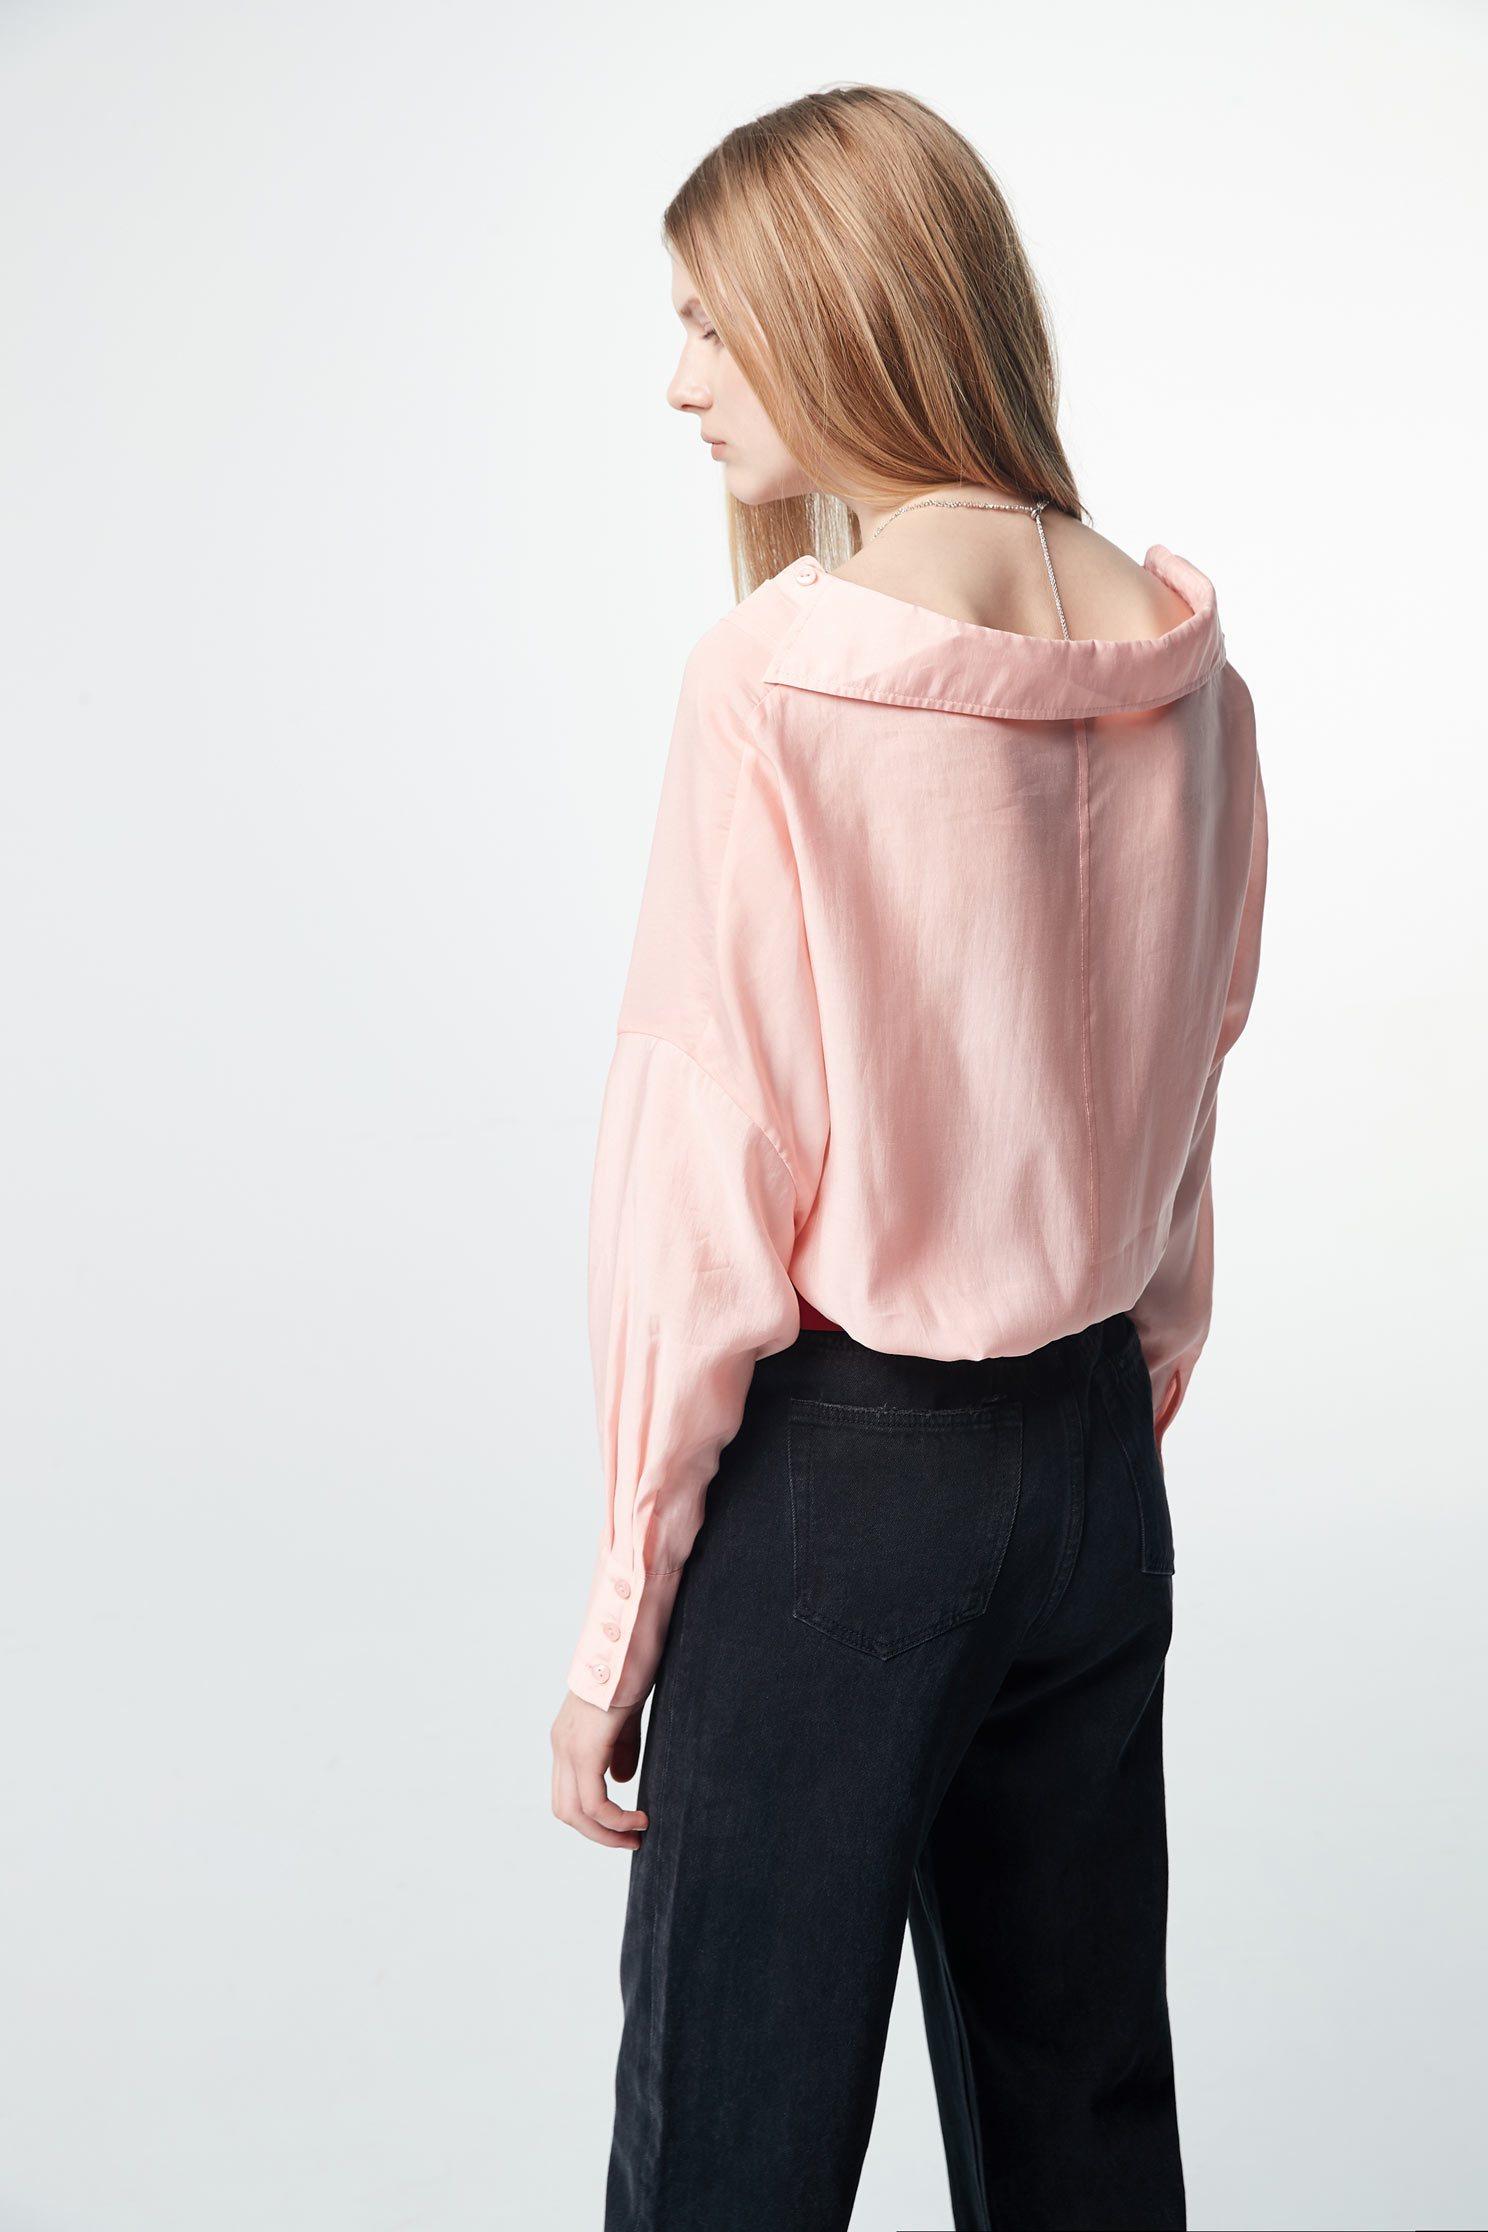 Back-pour long-sleeved thin shirt,top,valentine,i-select,blouse,longsleevetop,girlfriendsspringtour